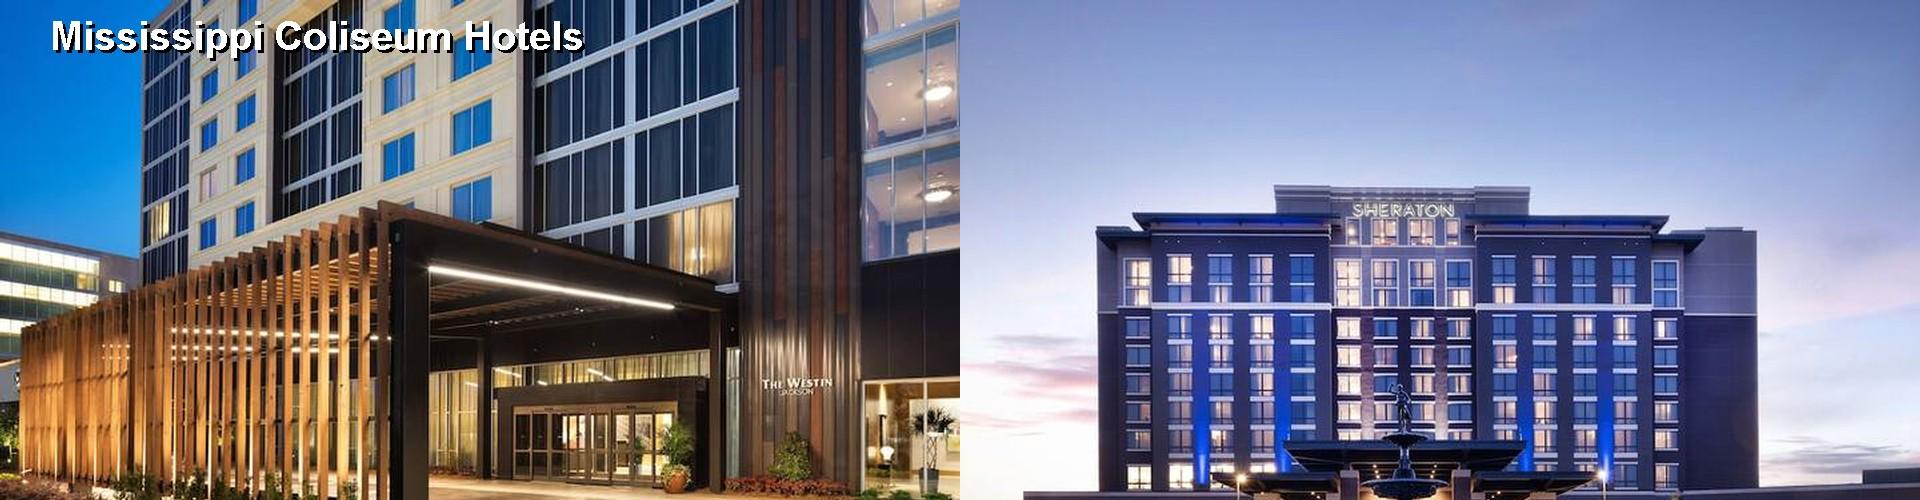 5 Best Hotels Near Mississippi Coliseum